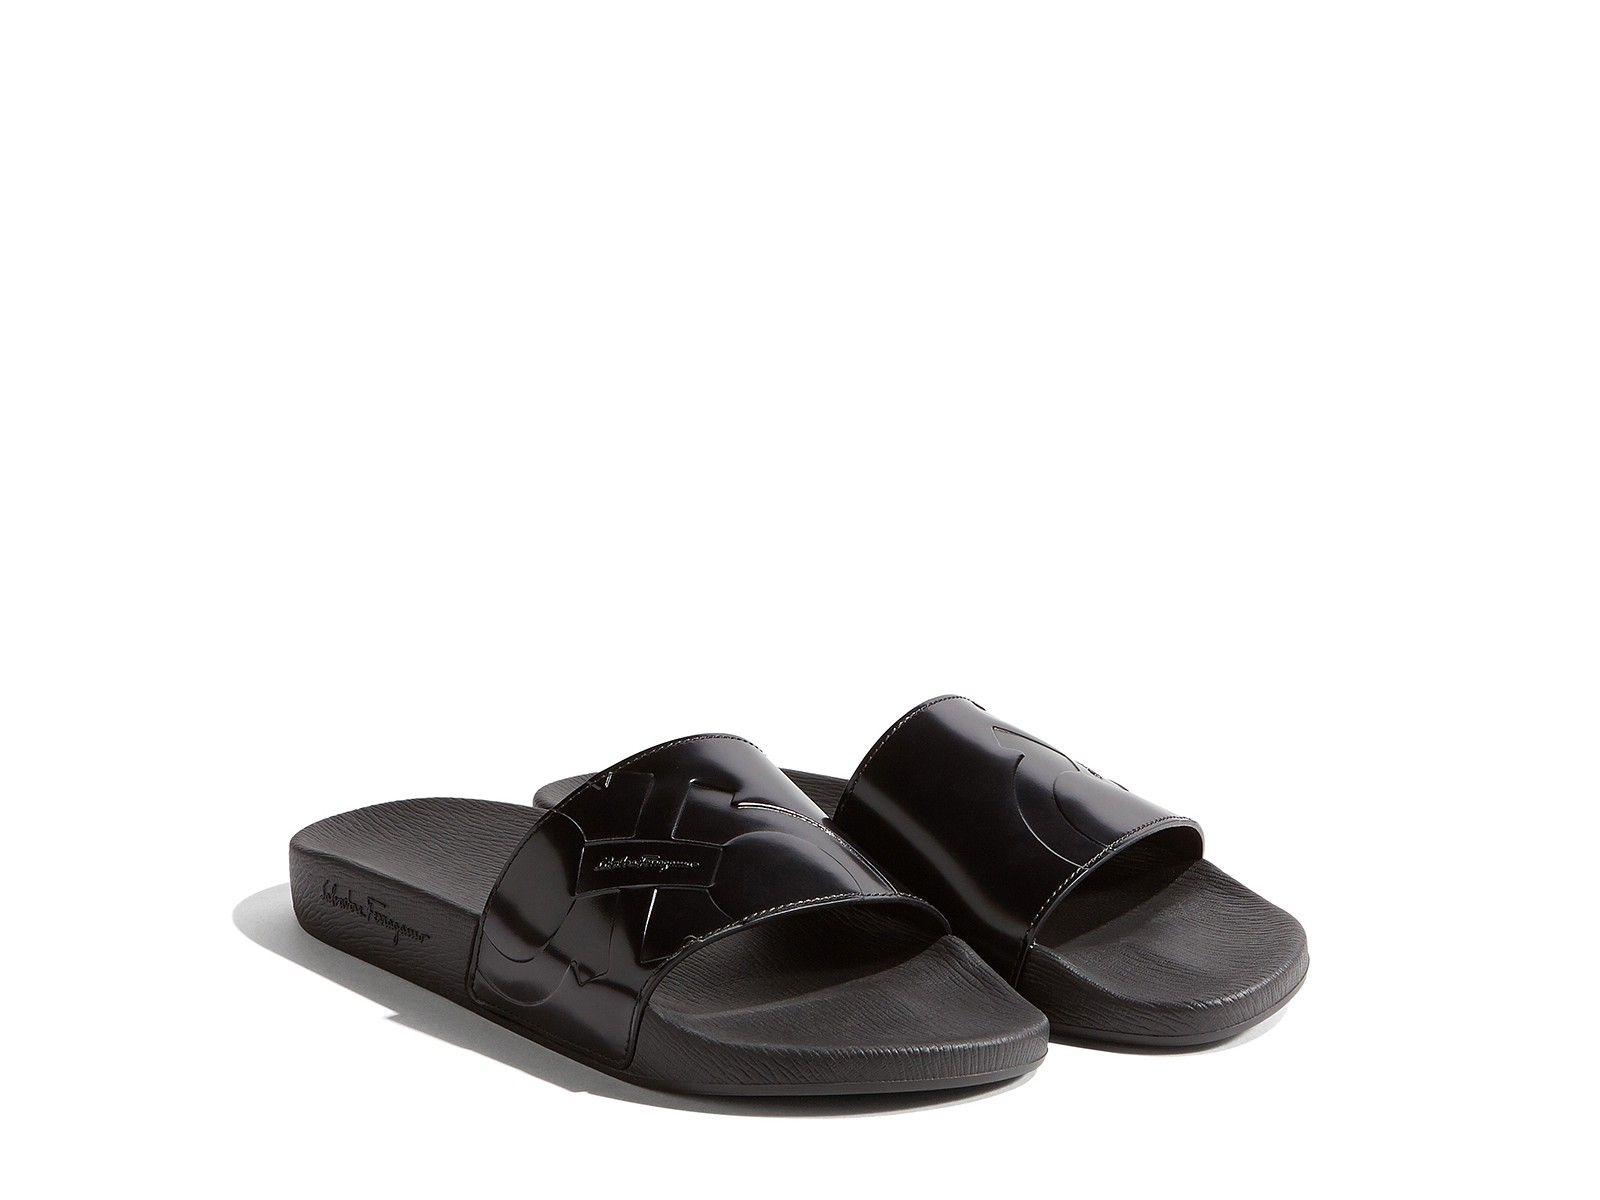 9a080d2bf54f SALVATORE FERRAGAMO Gancio Pool Slide Shoes.  salvatoreferragamo  shoes